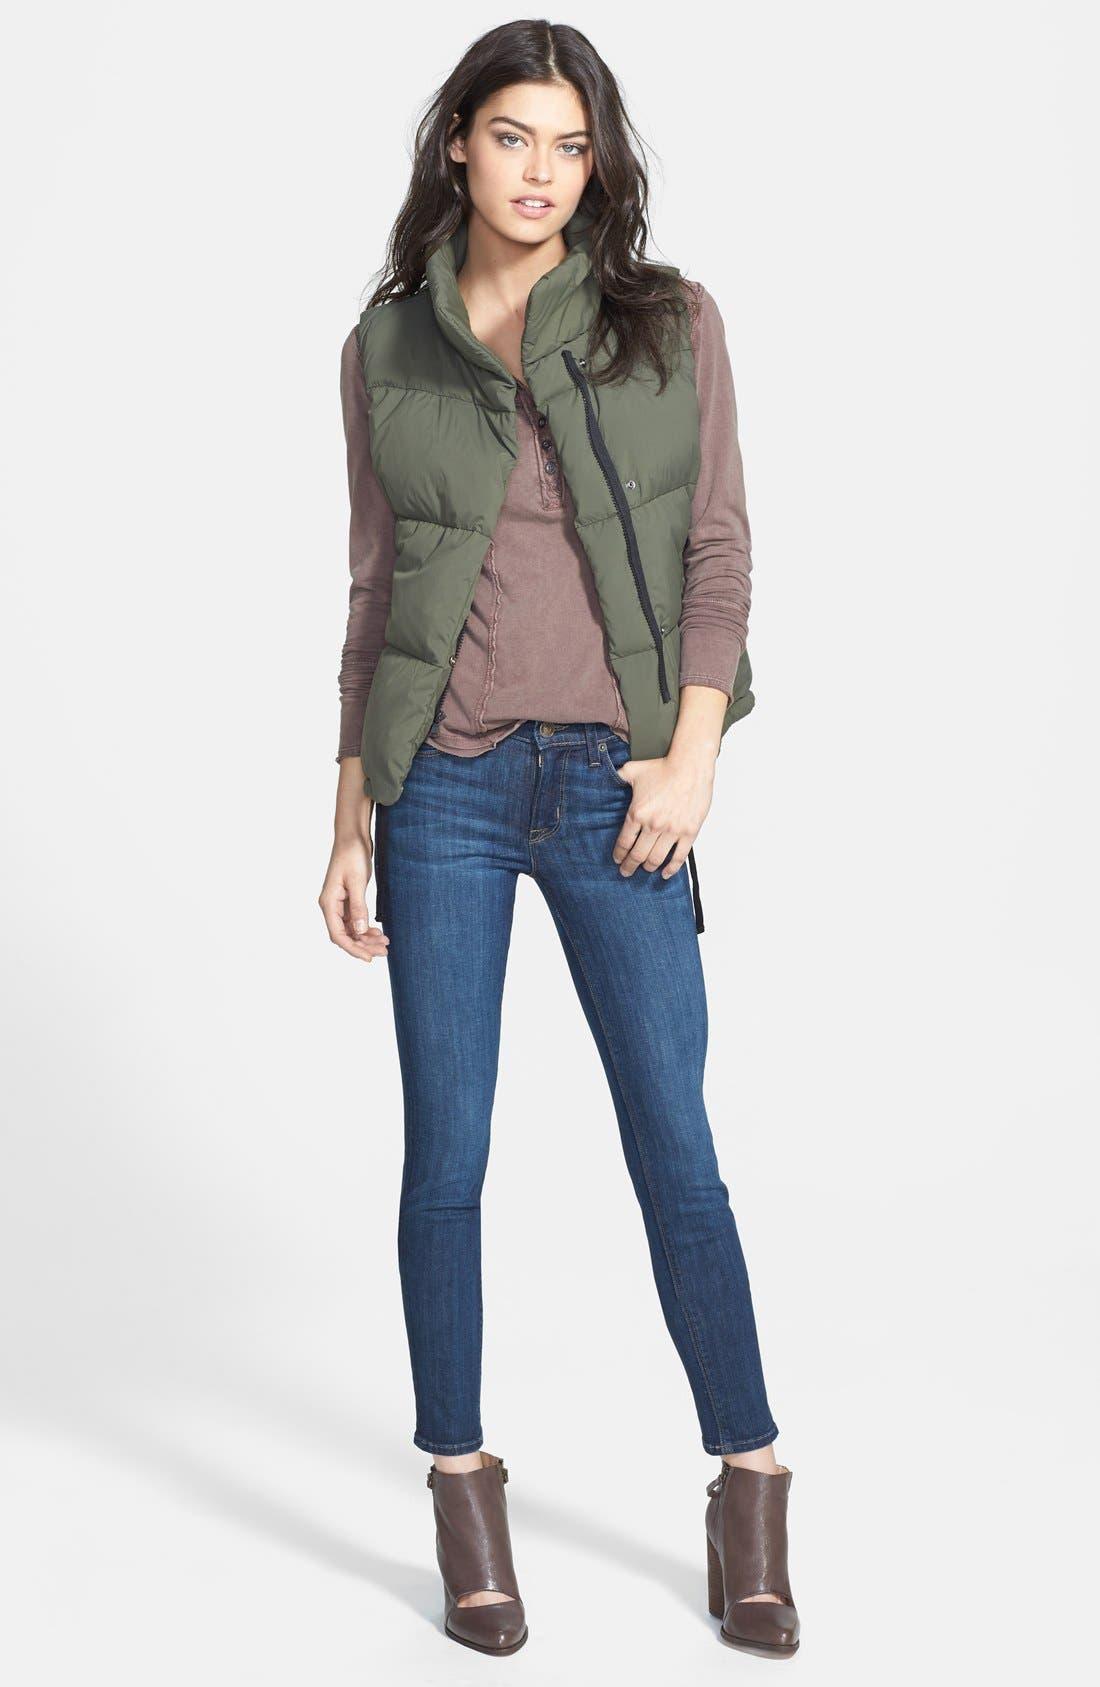 HUDSON JEANS, 'Collette' Skinny Jeans, Alternate thumbnail 3, color, 400